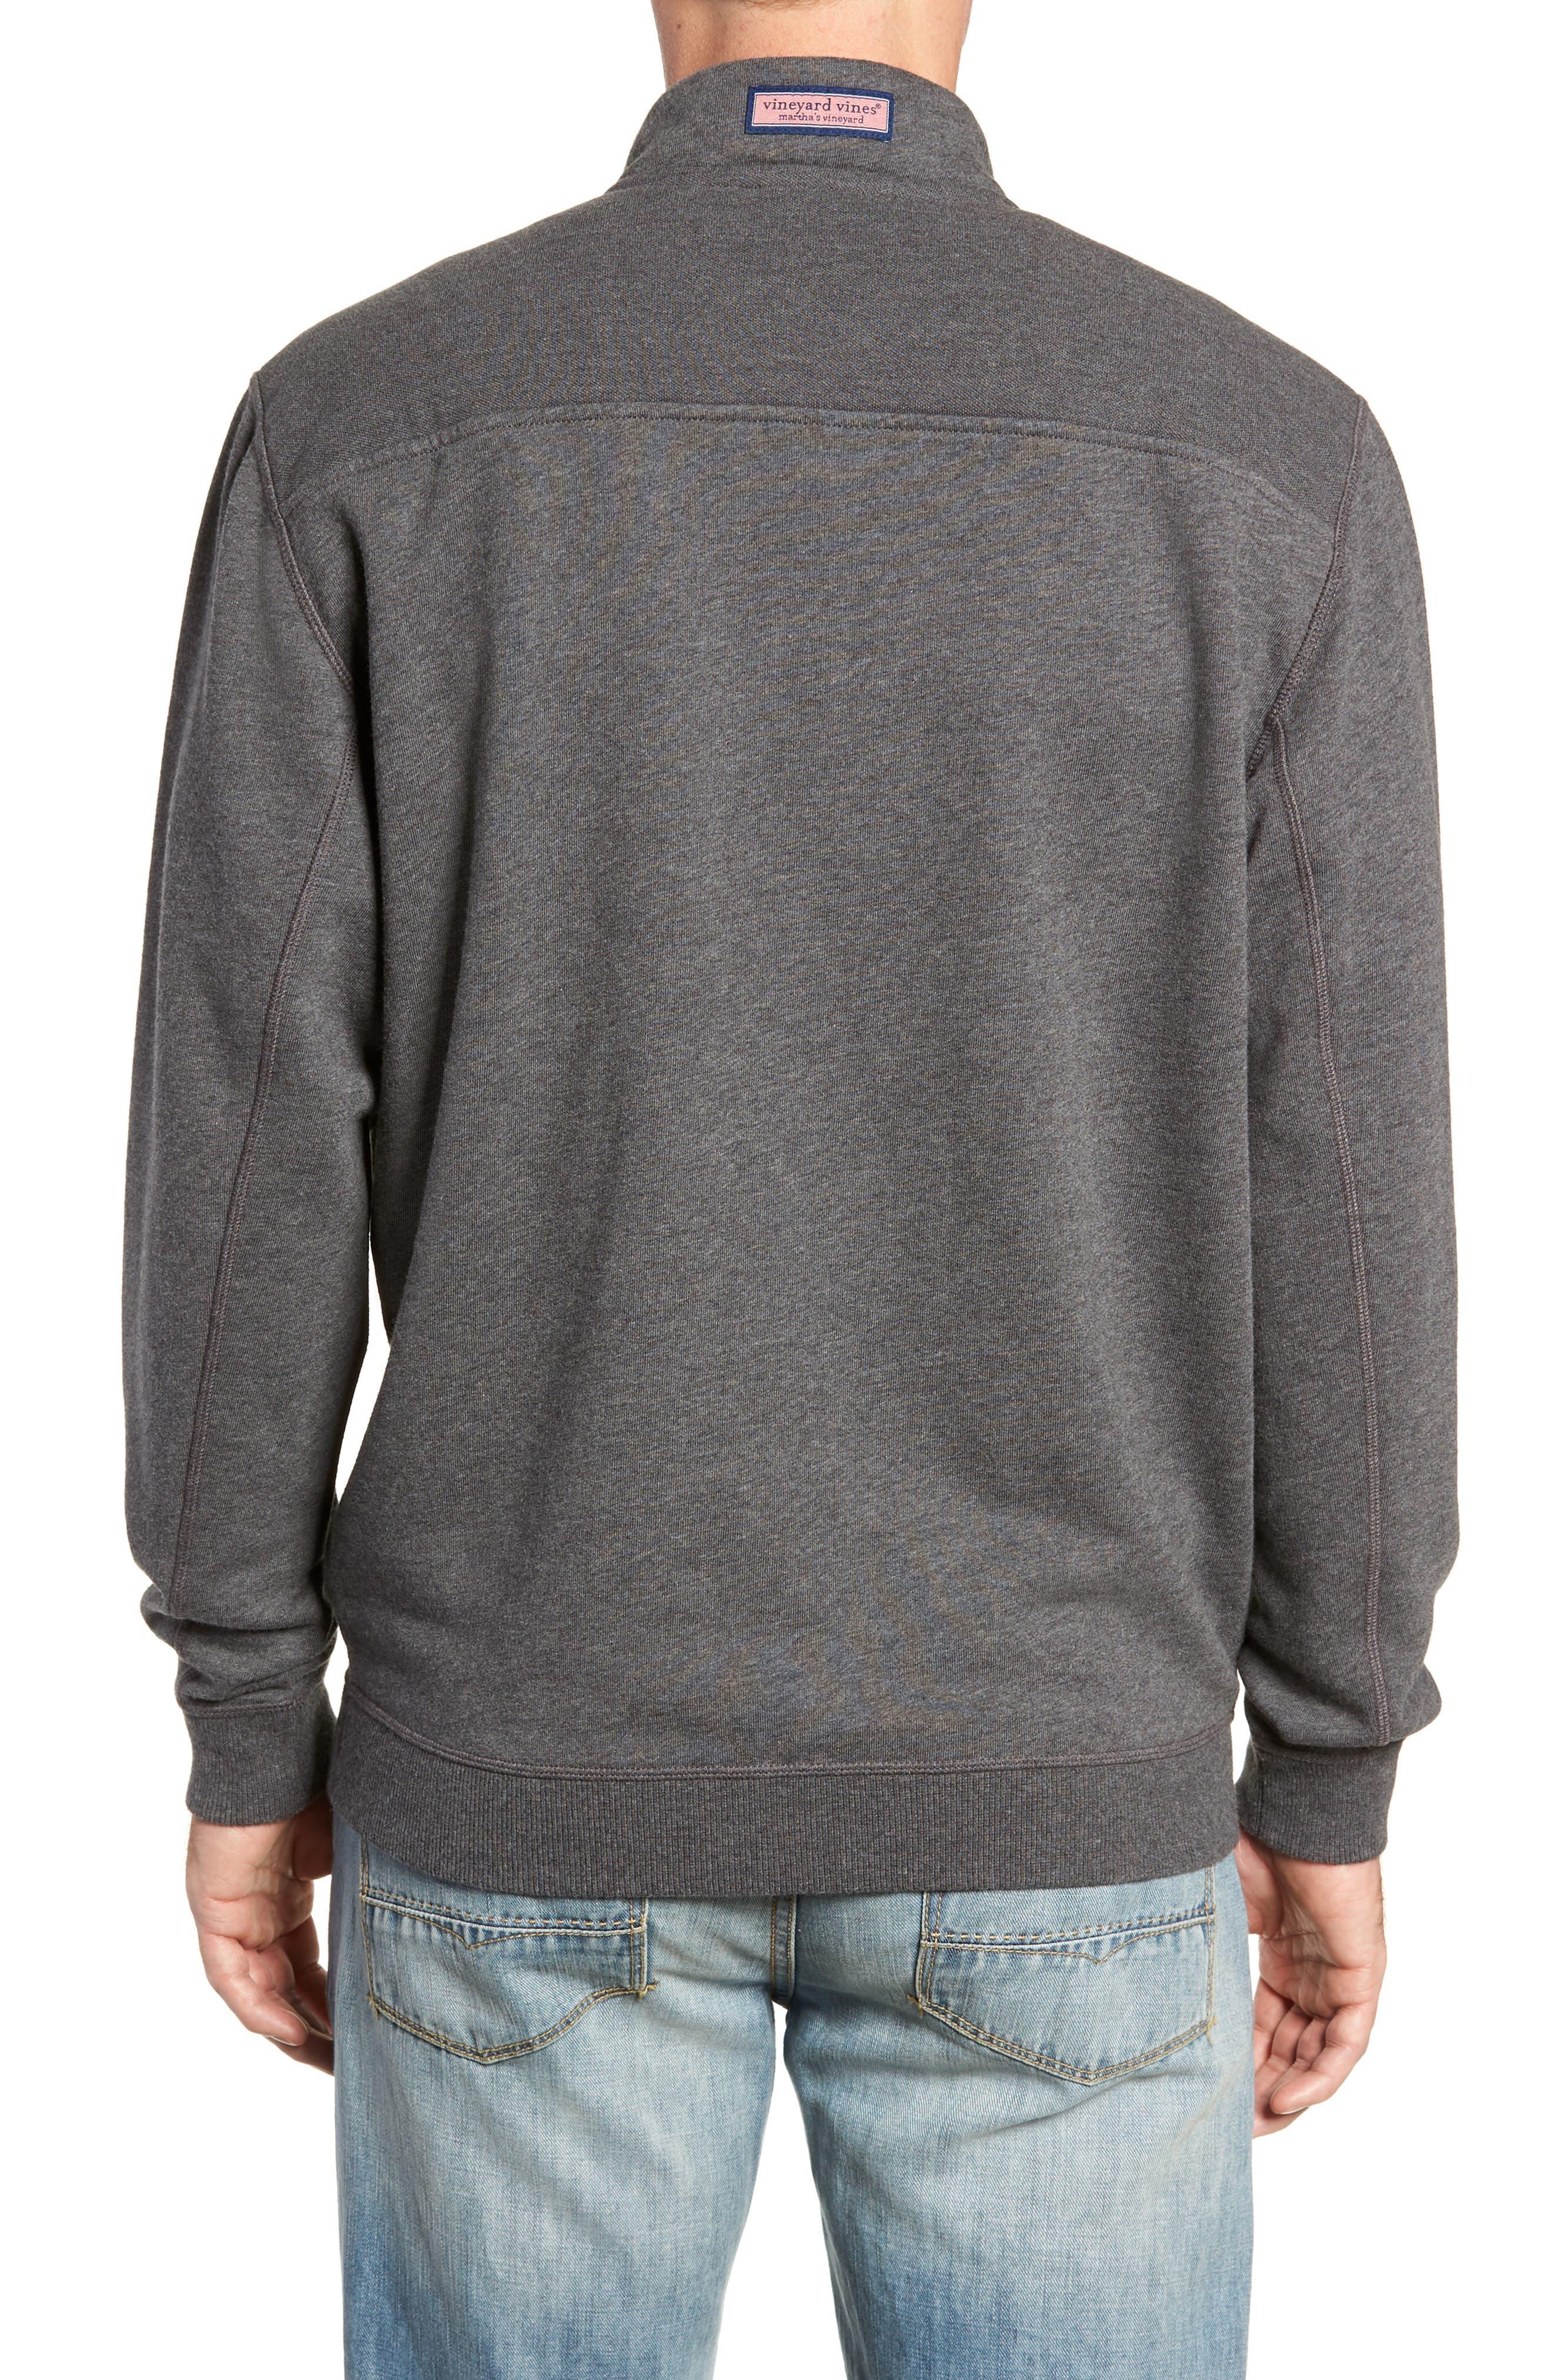 Quarter Zip Fleece Pullover,                             Alternate thumbnail 2, color,                             PEBBLE